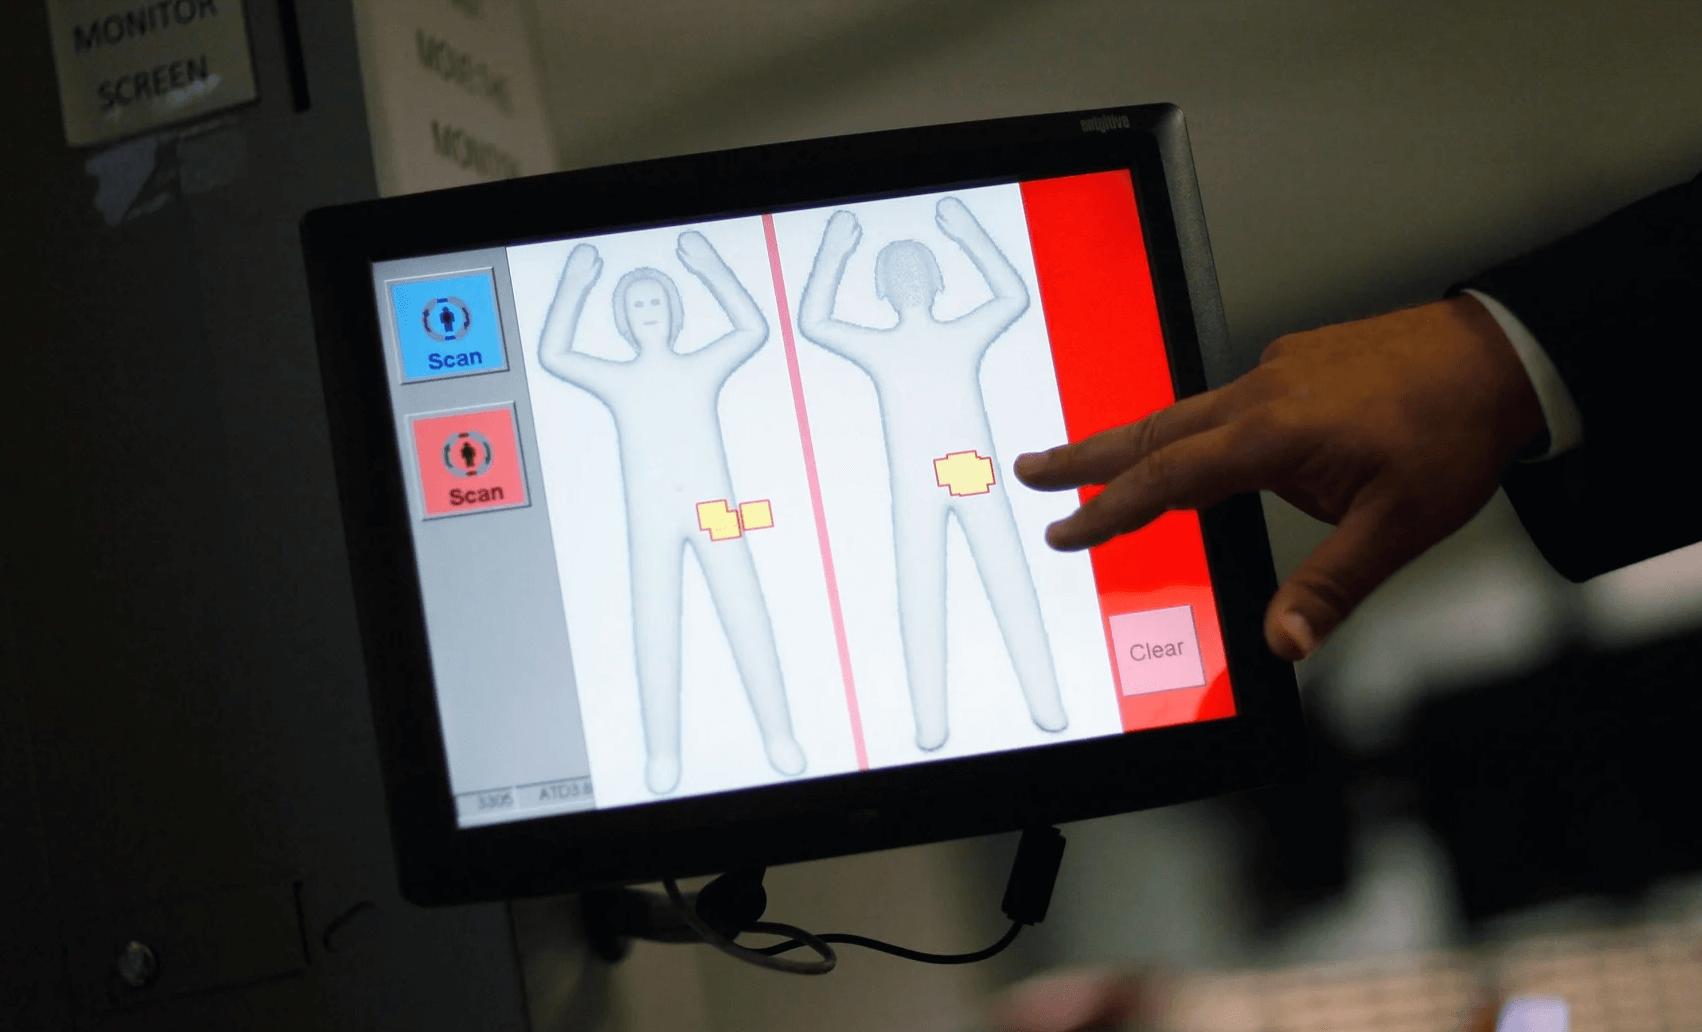 TSA airport full body scanner screen with binary gender options